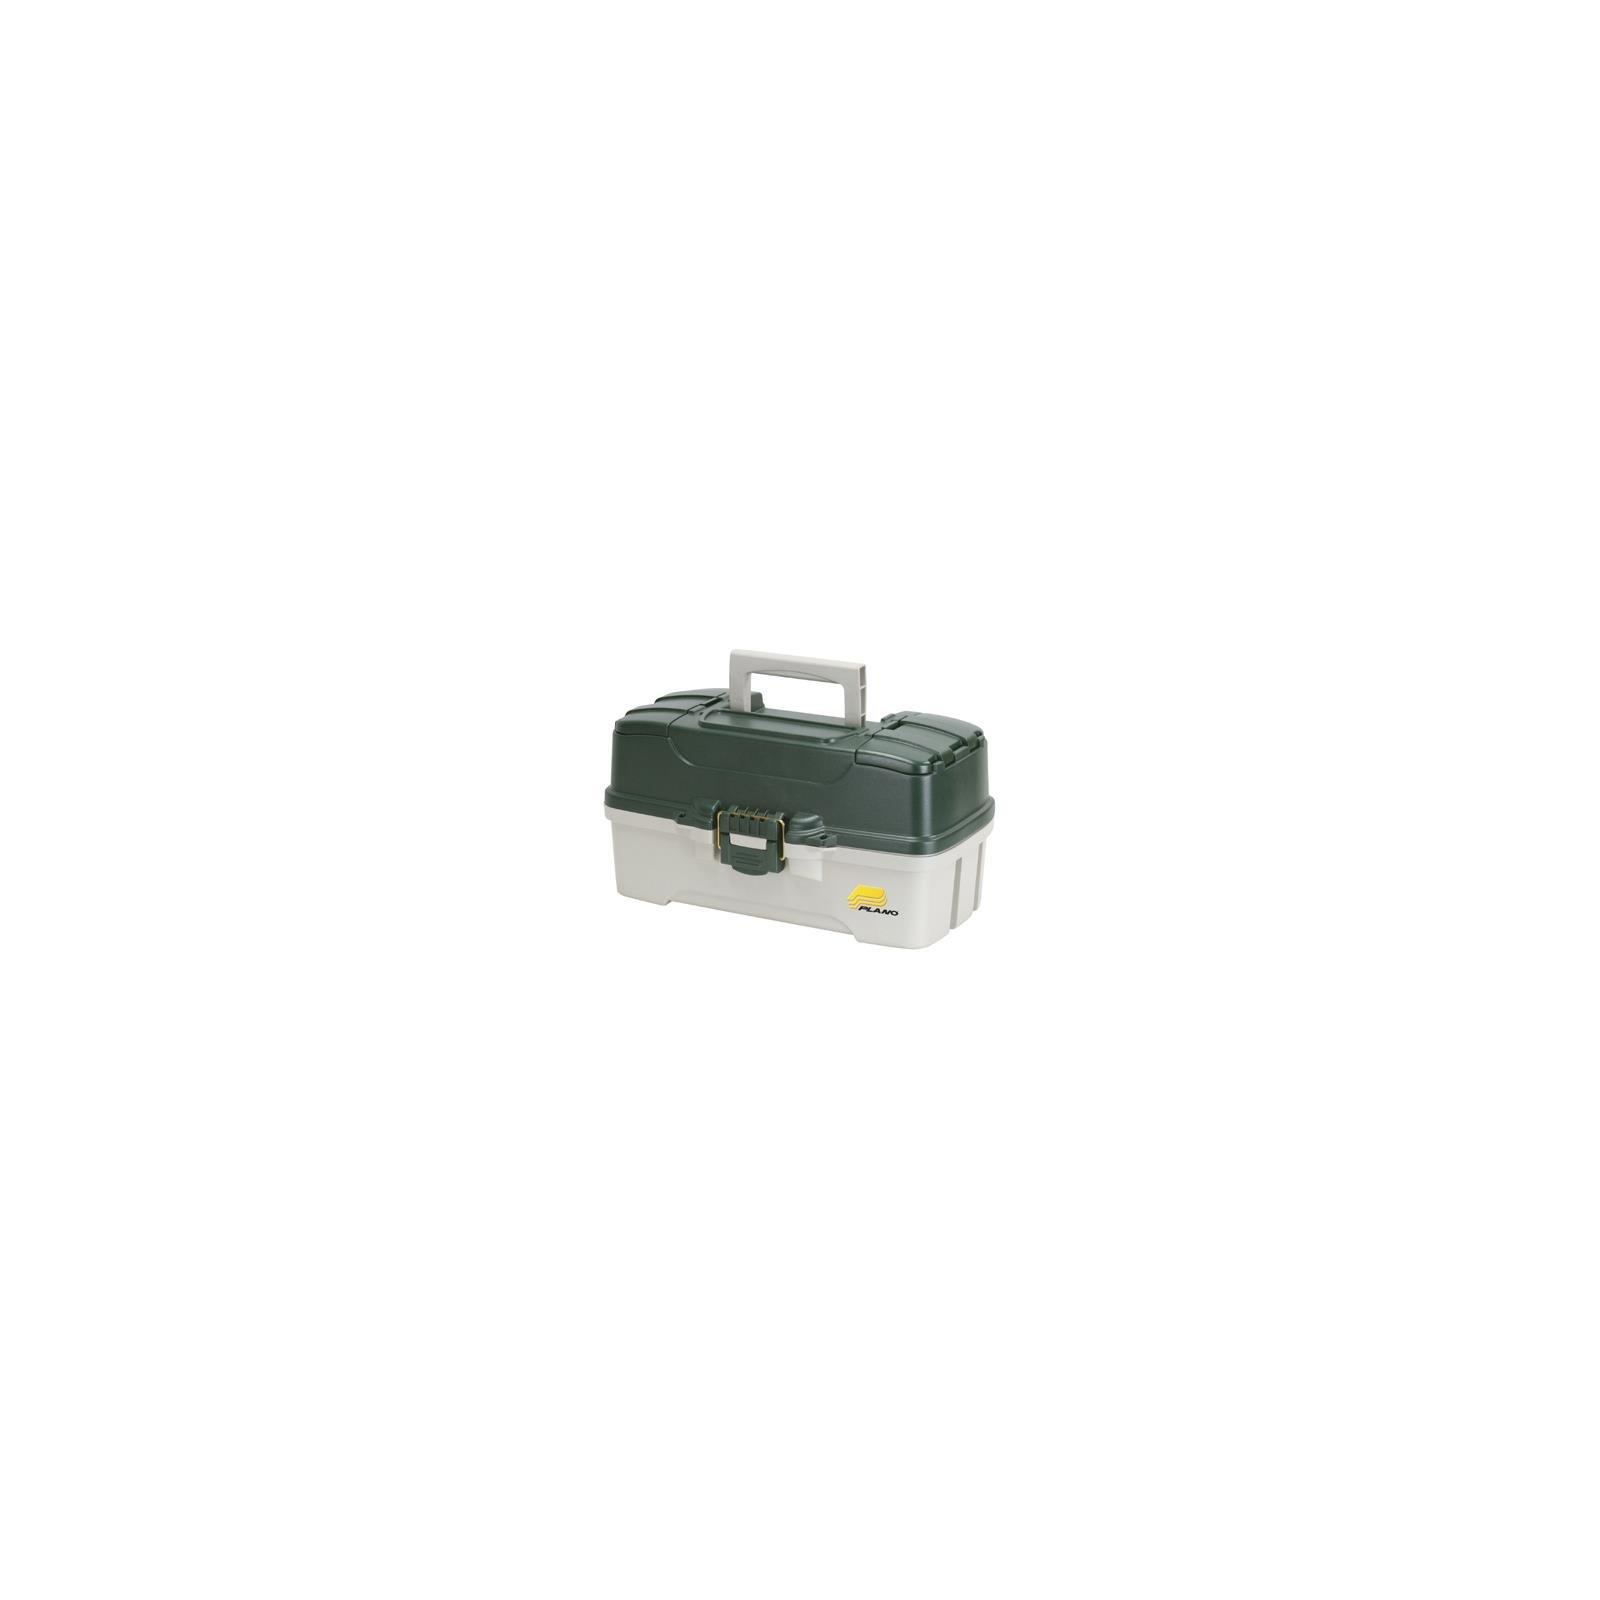 Plano Molding 620304 Fishing Tackle Box, Green Metallic/Off White, 3-Tray - Quantity 4 by Plano Molding Co